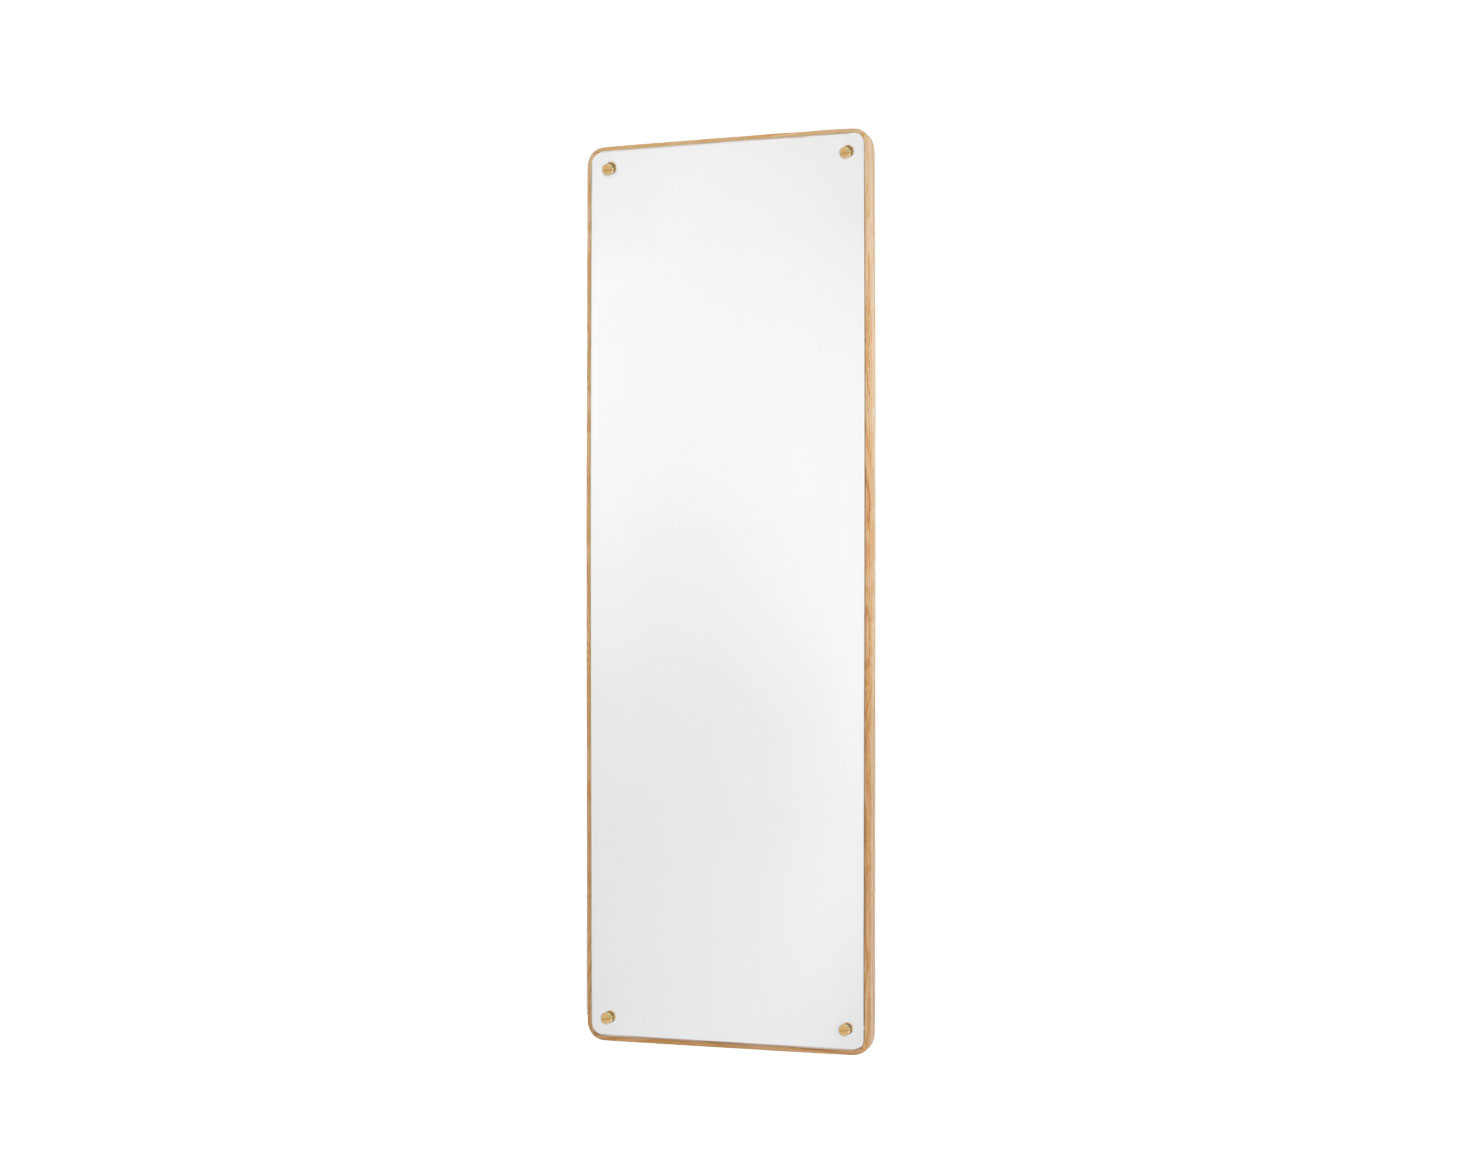 Frama RM-1 Mirror Large